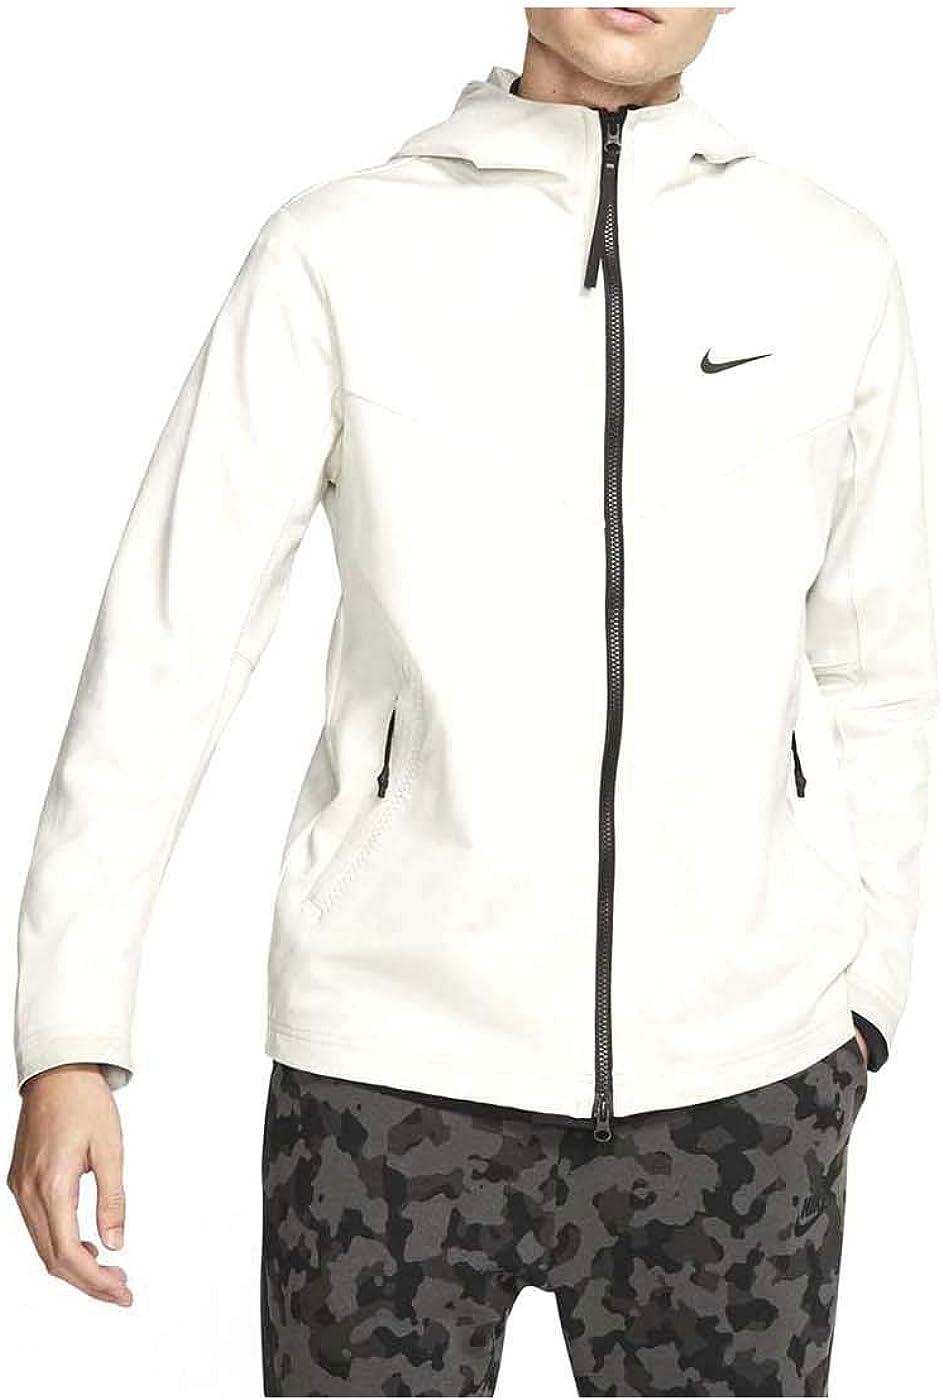 NIKE Chaqueta Sportswear Tech Pack Light Beige Hombre Medium Beige: Amazon.es: Ropa y accesorios